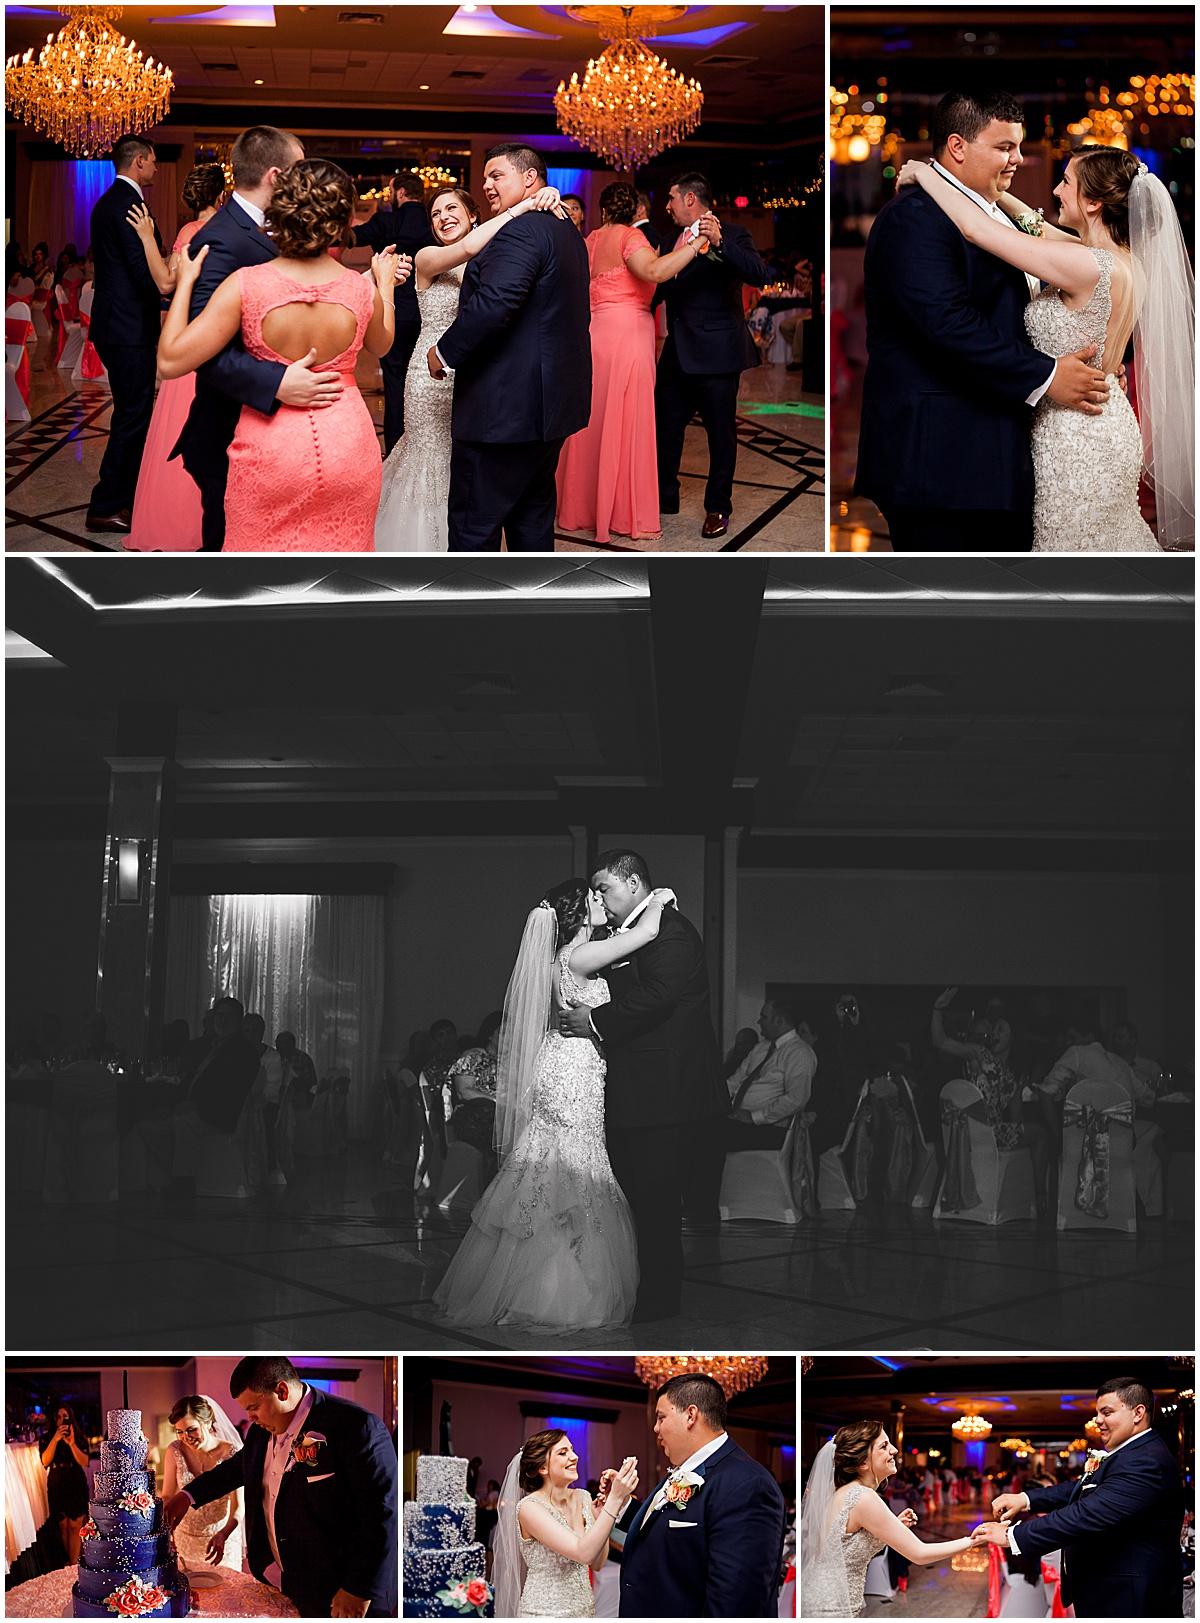 wedding reception at days inn butler pa